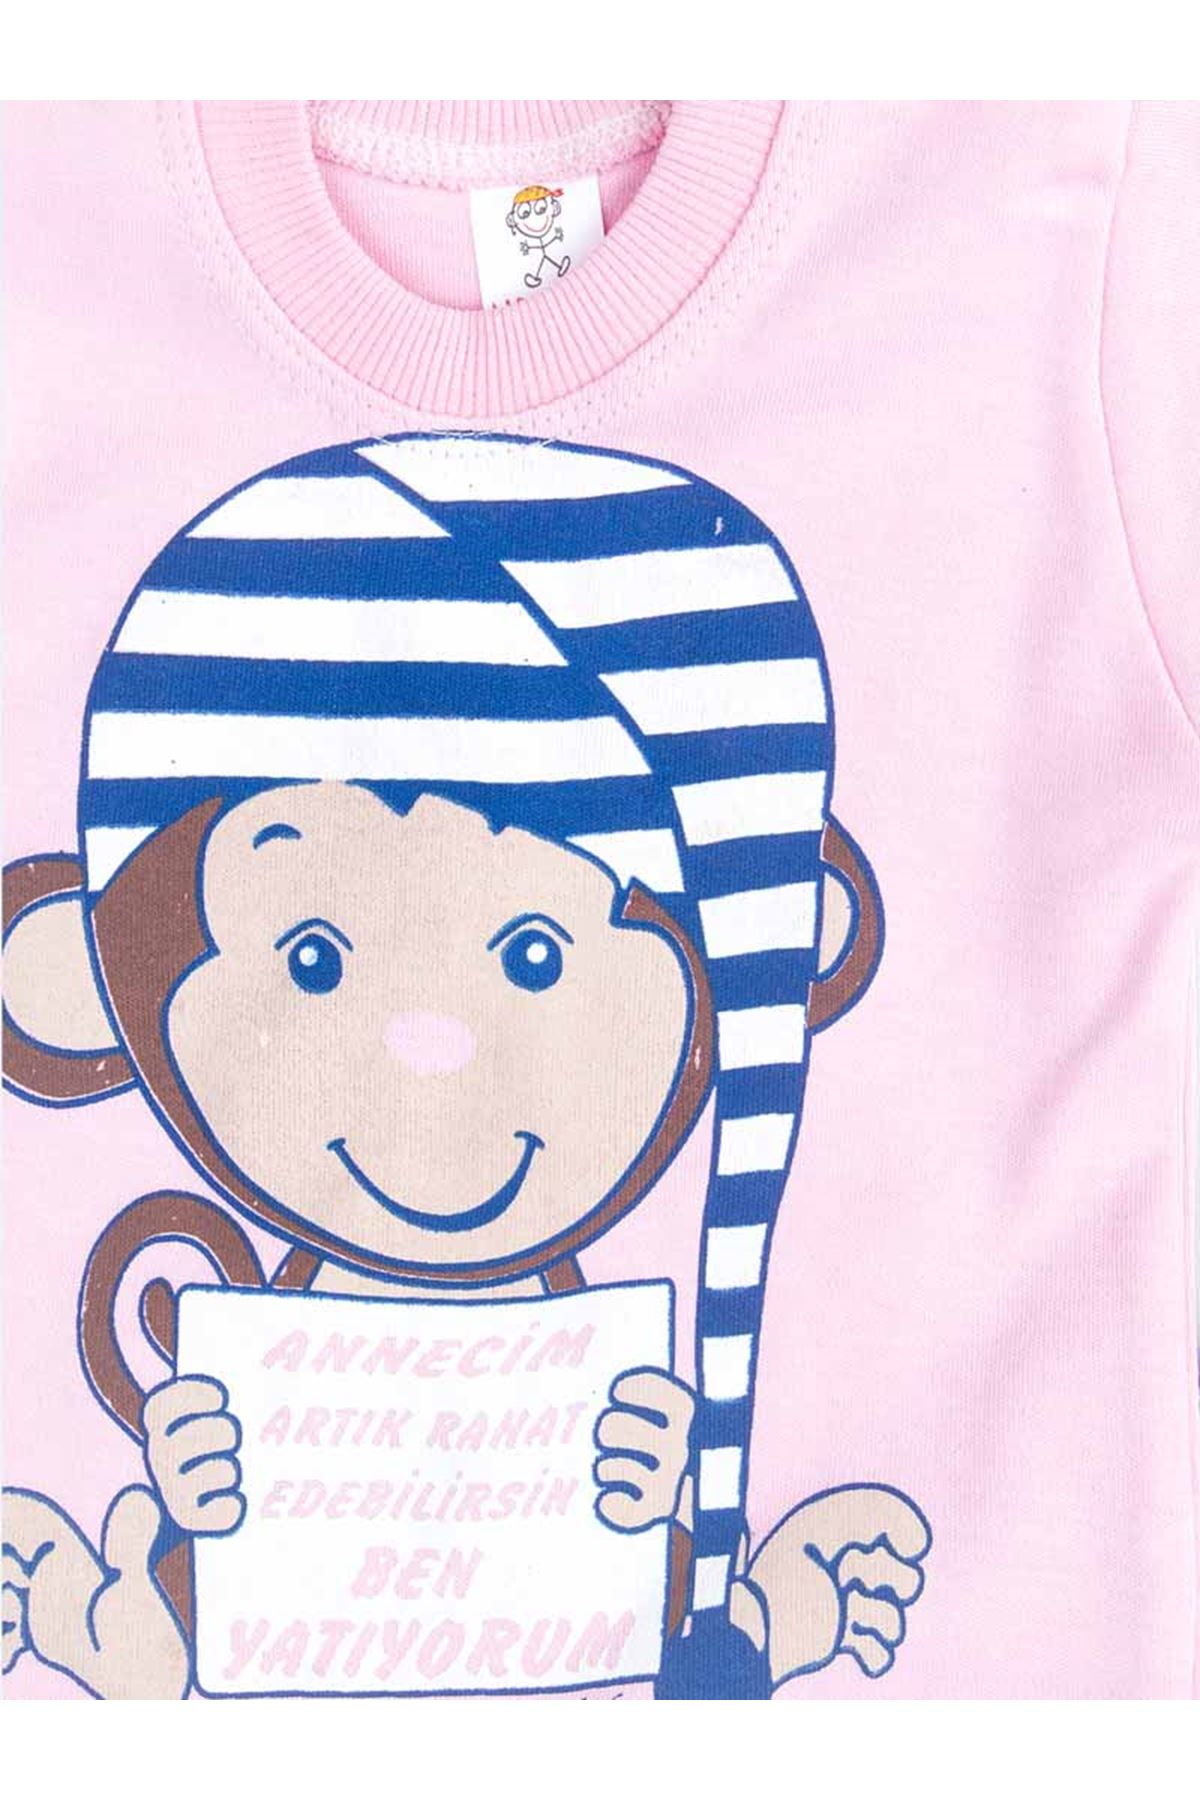 Pembe Kız Bebek Pijama Takımı